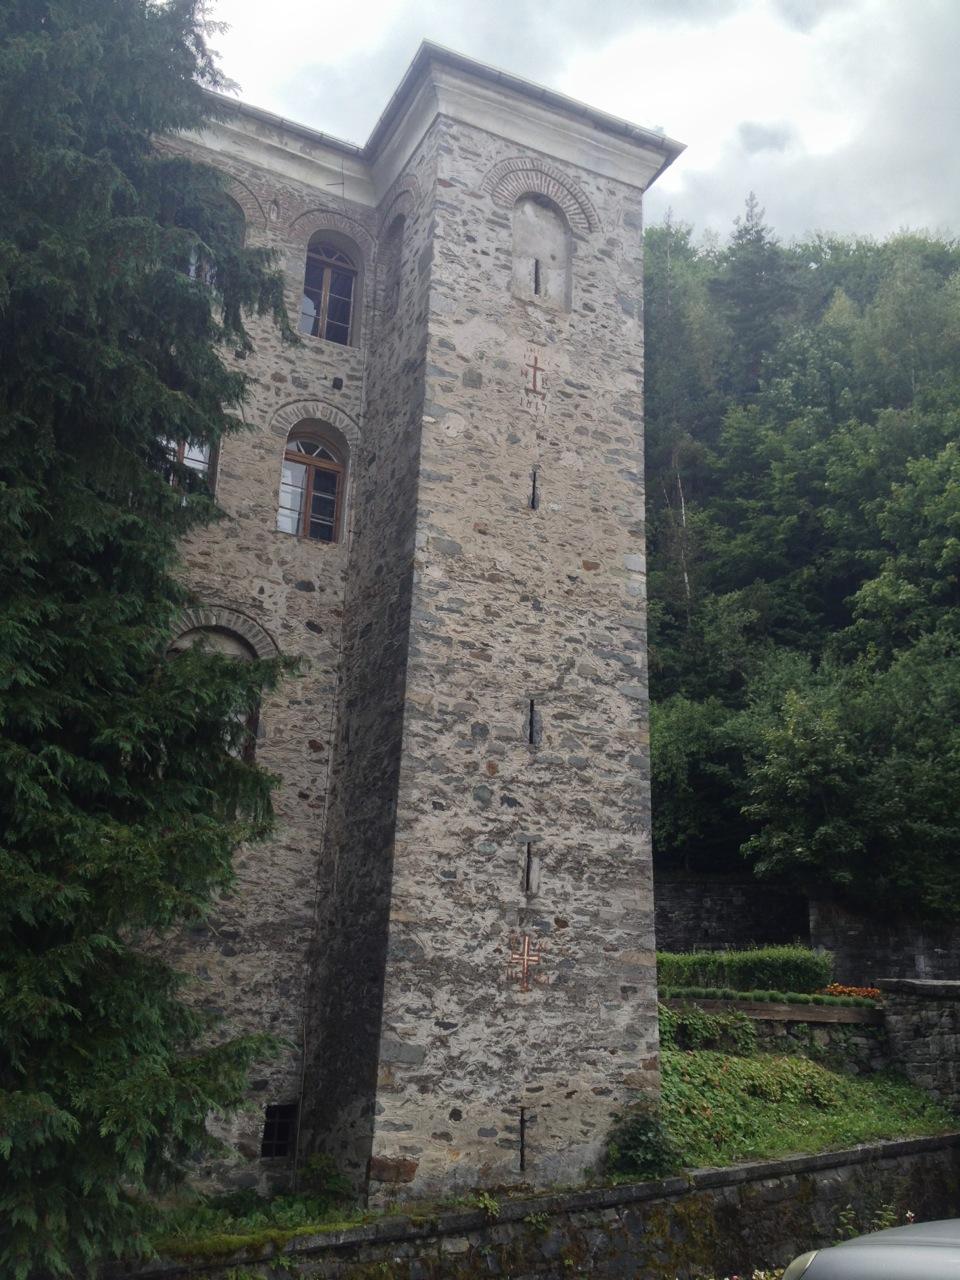 Rila Monastery's outer walls